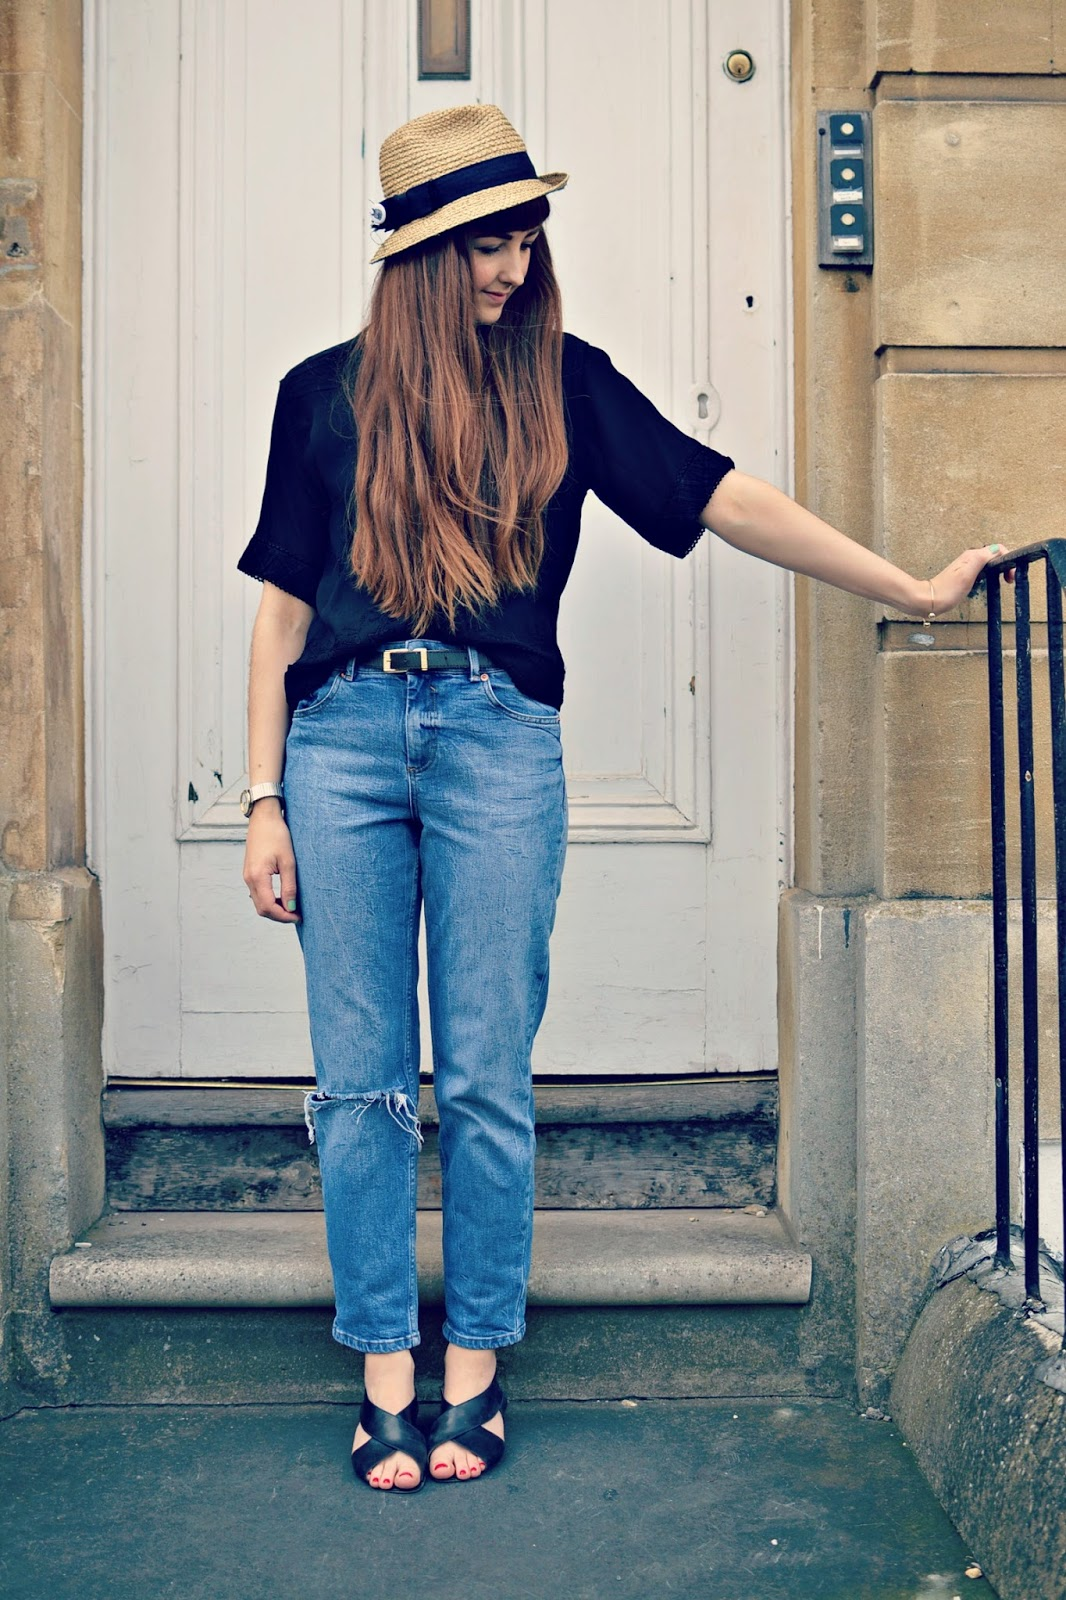 vintage outfit post, asos jeans, vintage blouse